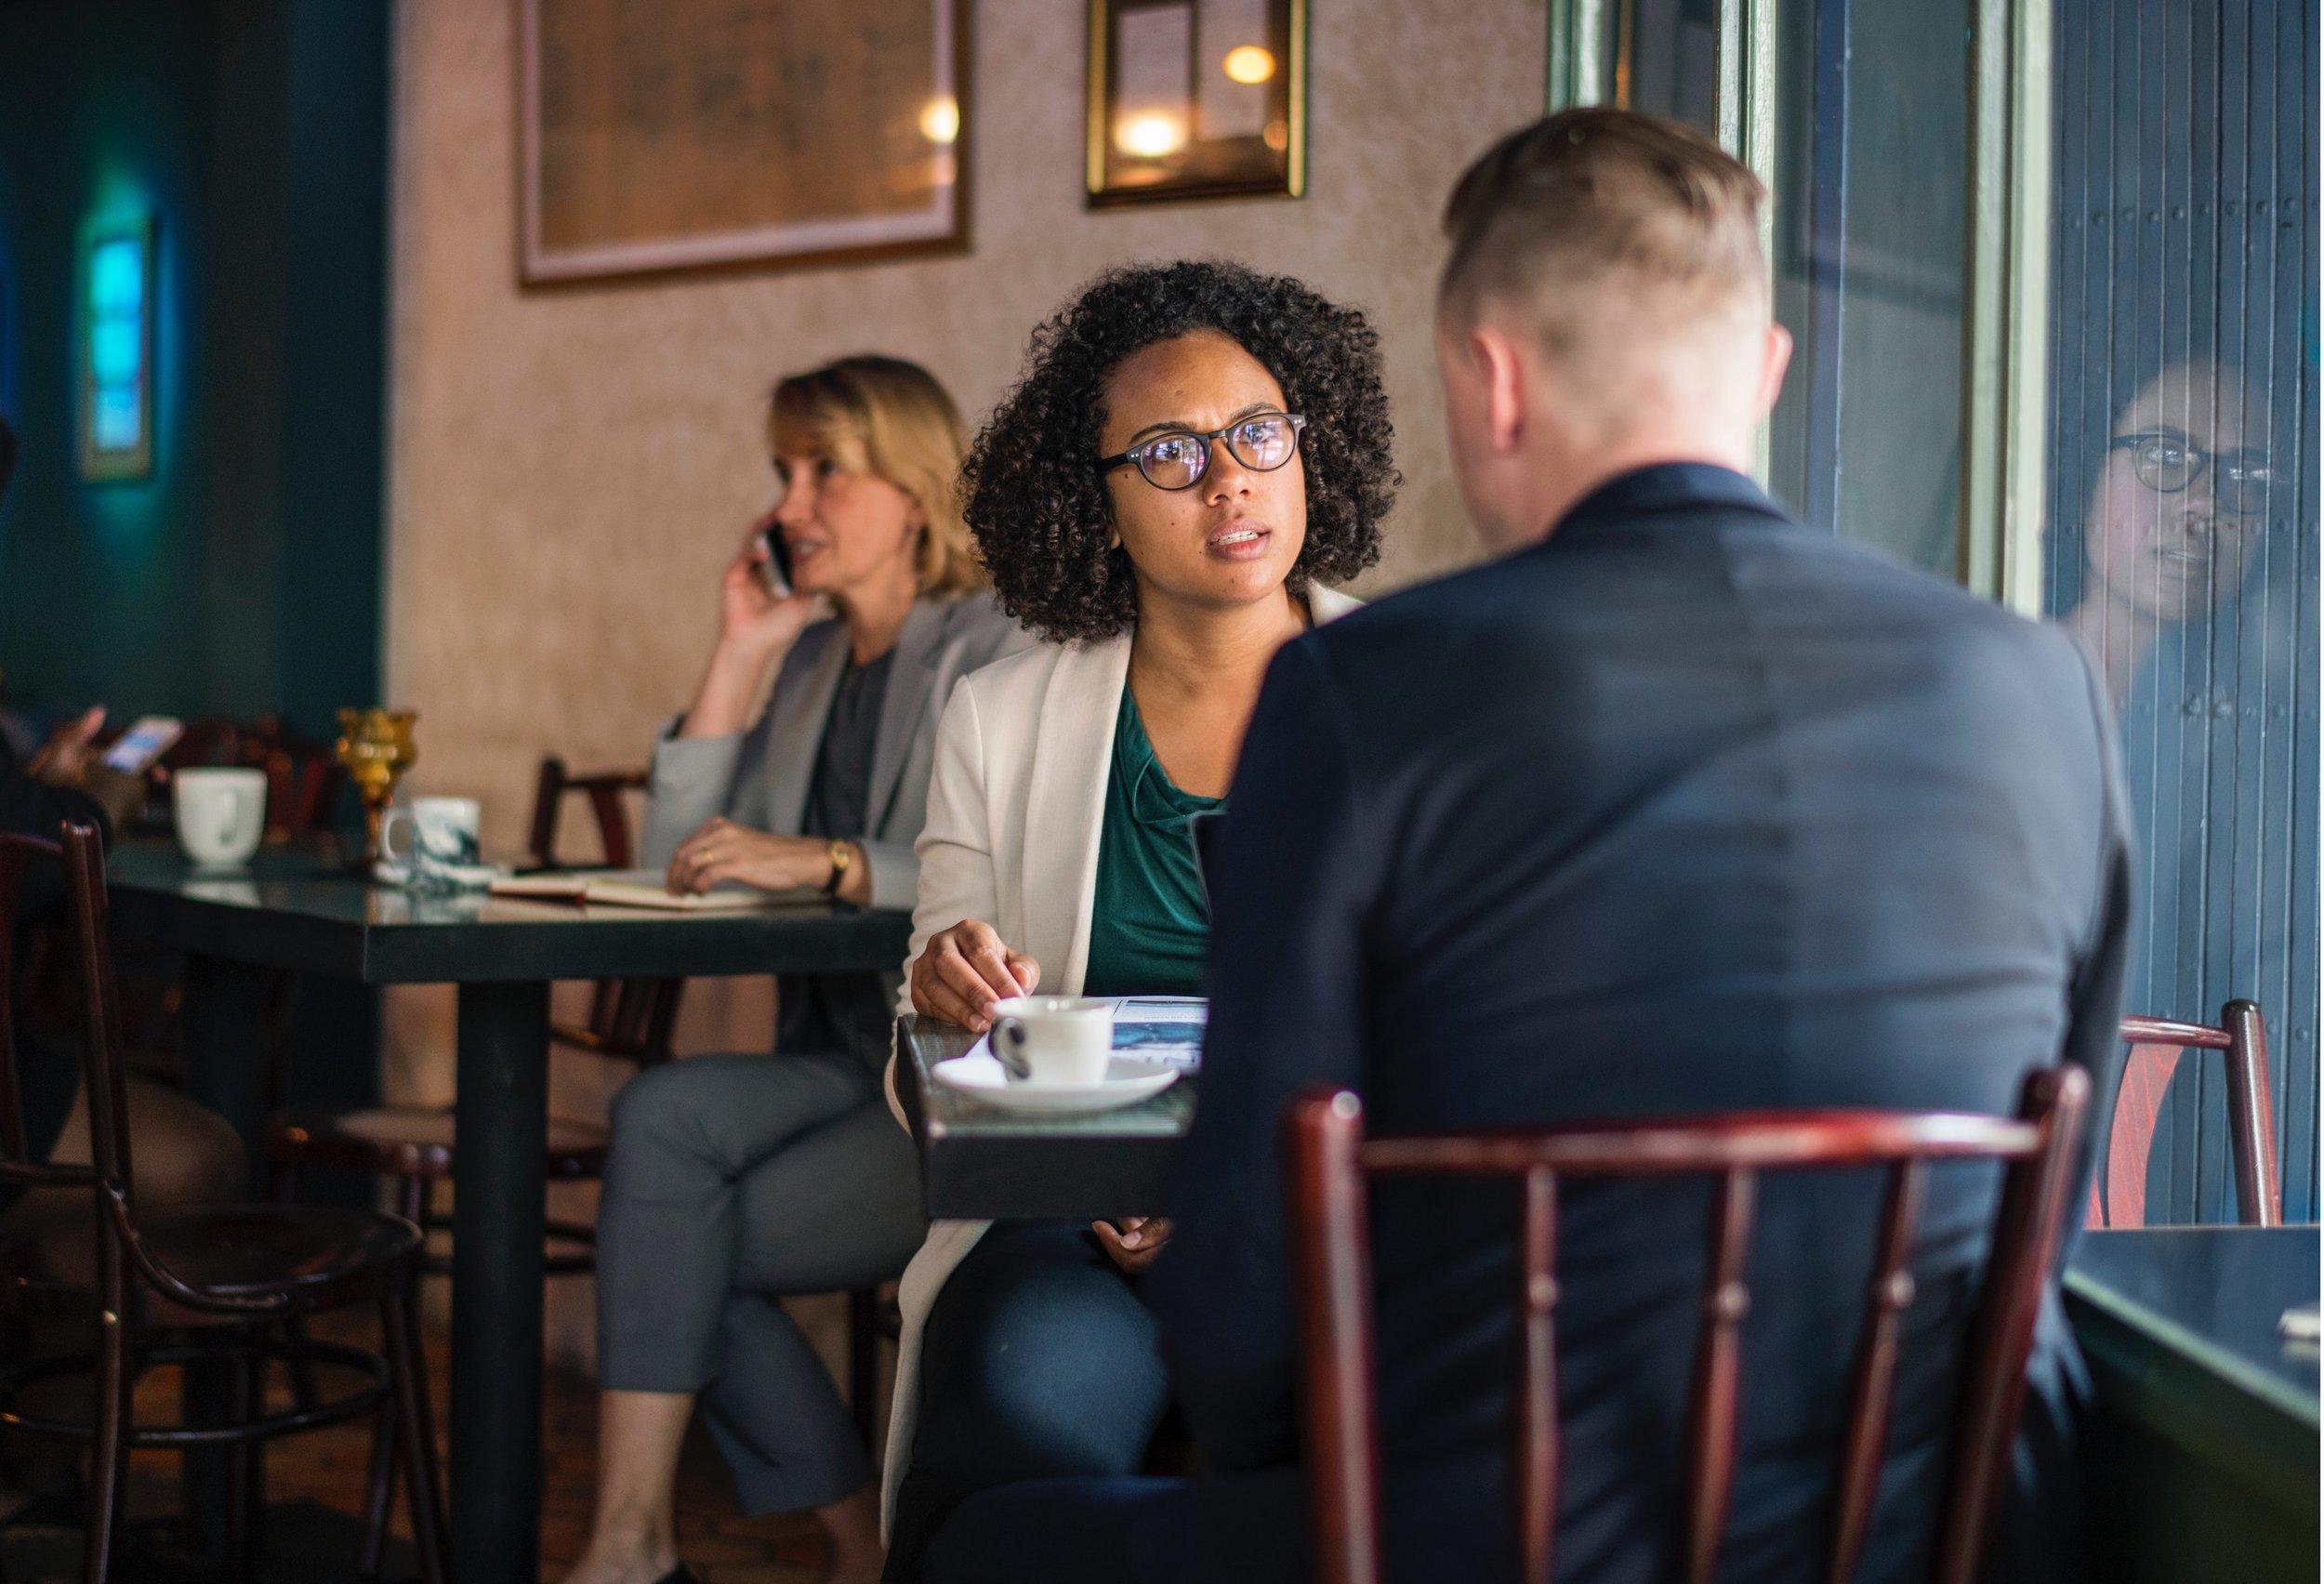 Women talking to man in cafe